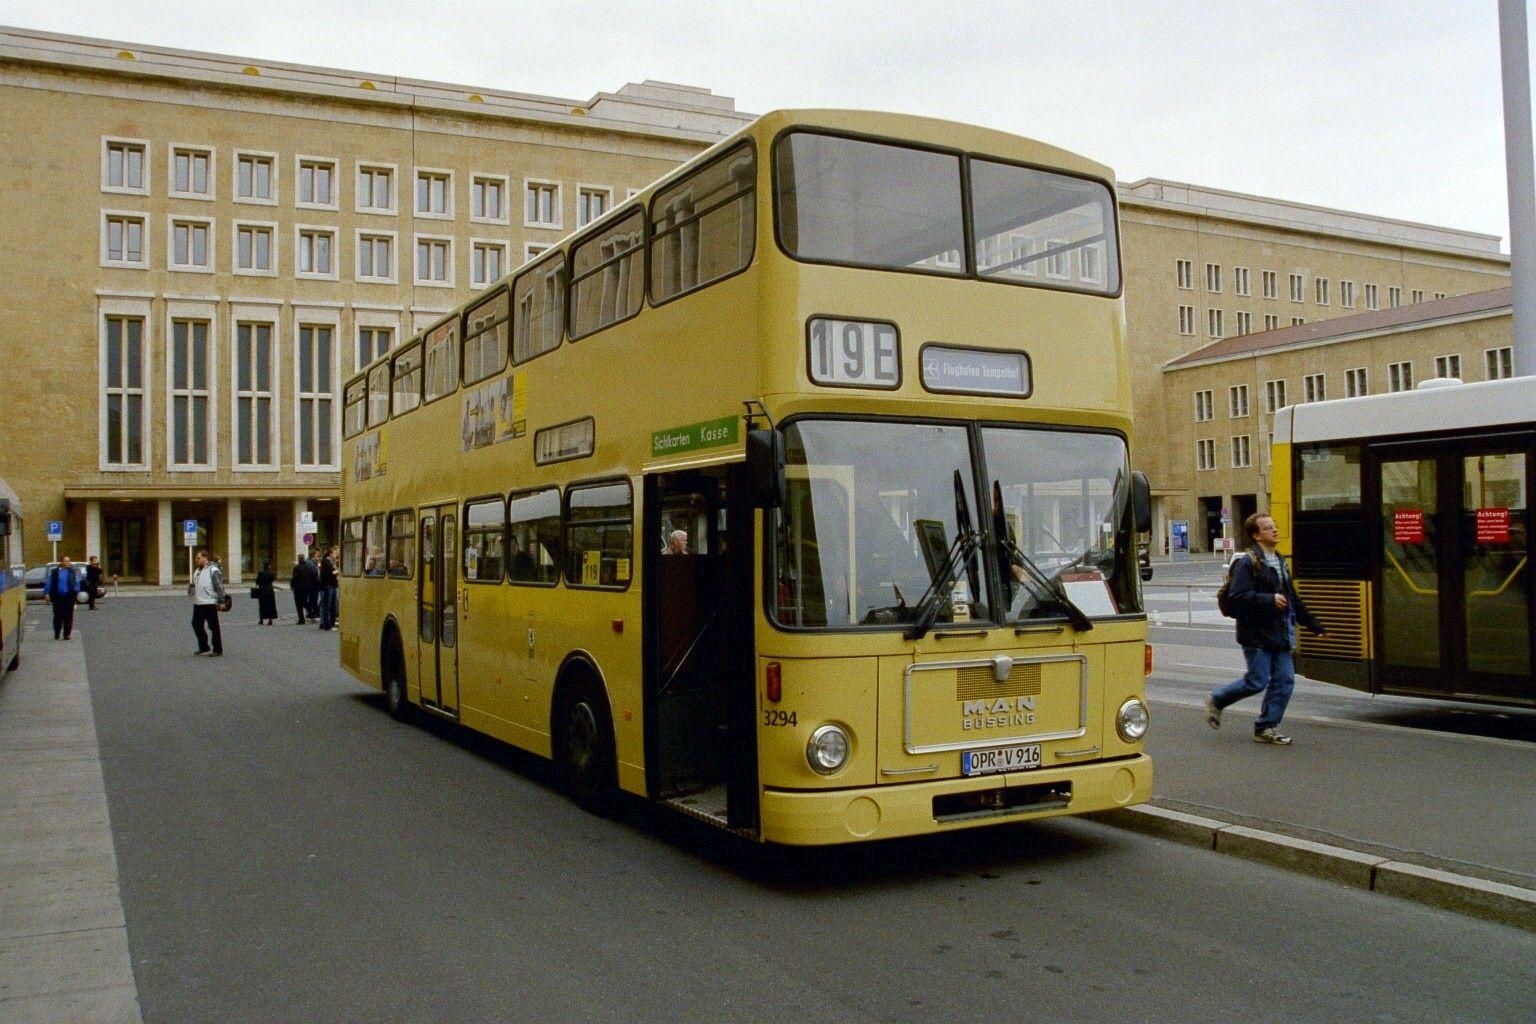 Bus 3294, Flughafen Tempelhof, Mai 2004